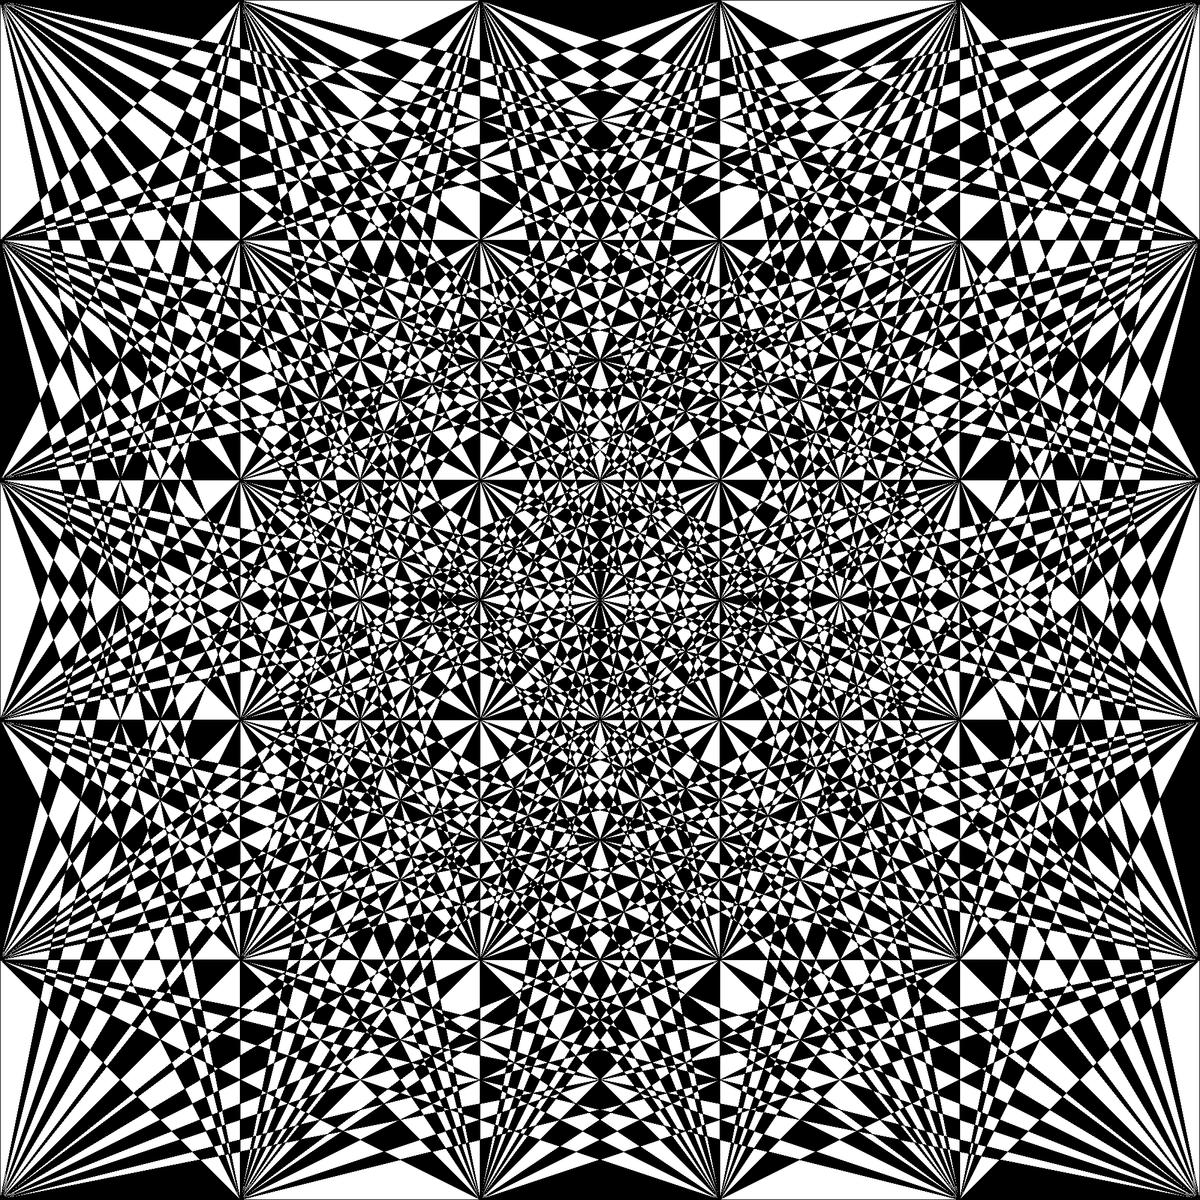 f:id:Hassium277:20200218142006p:plain